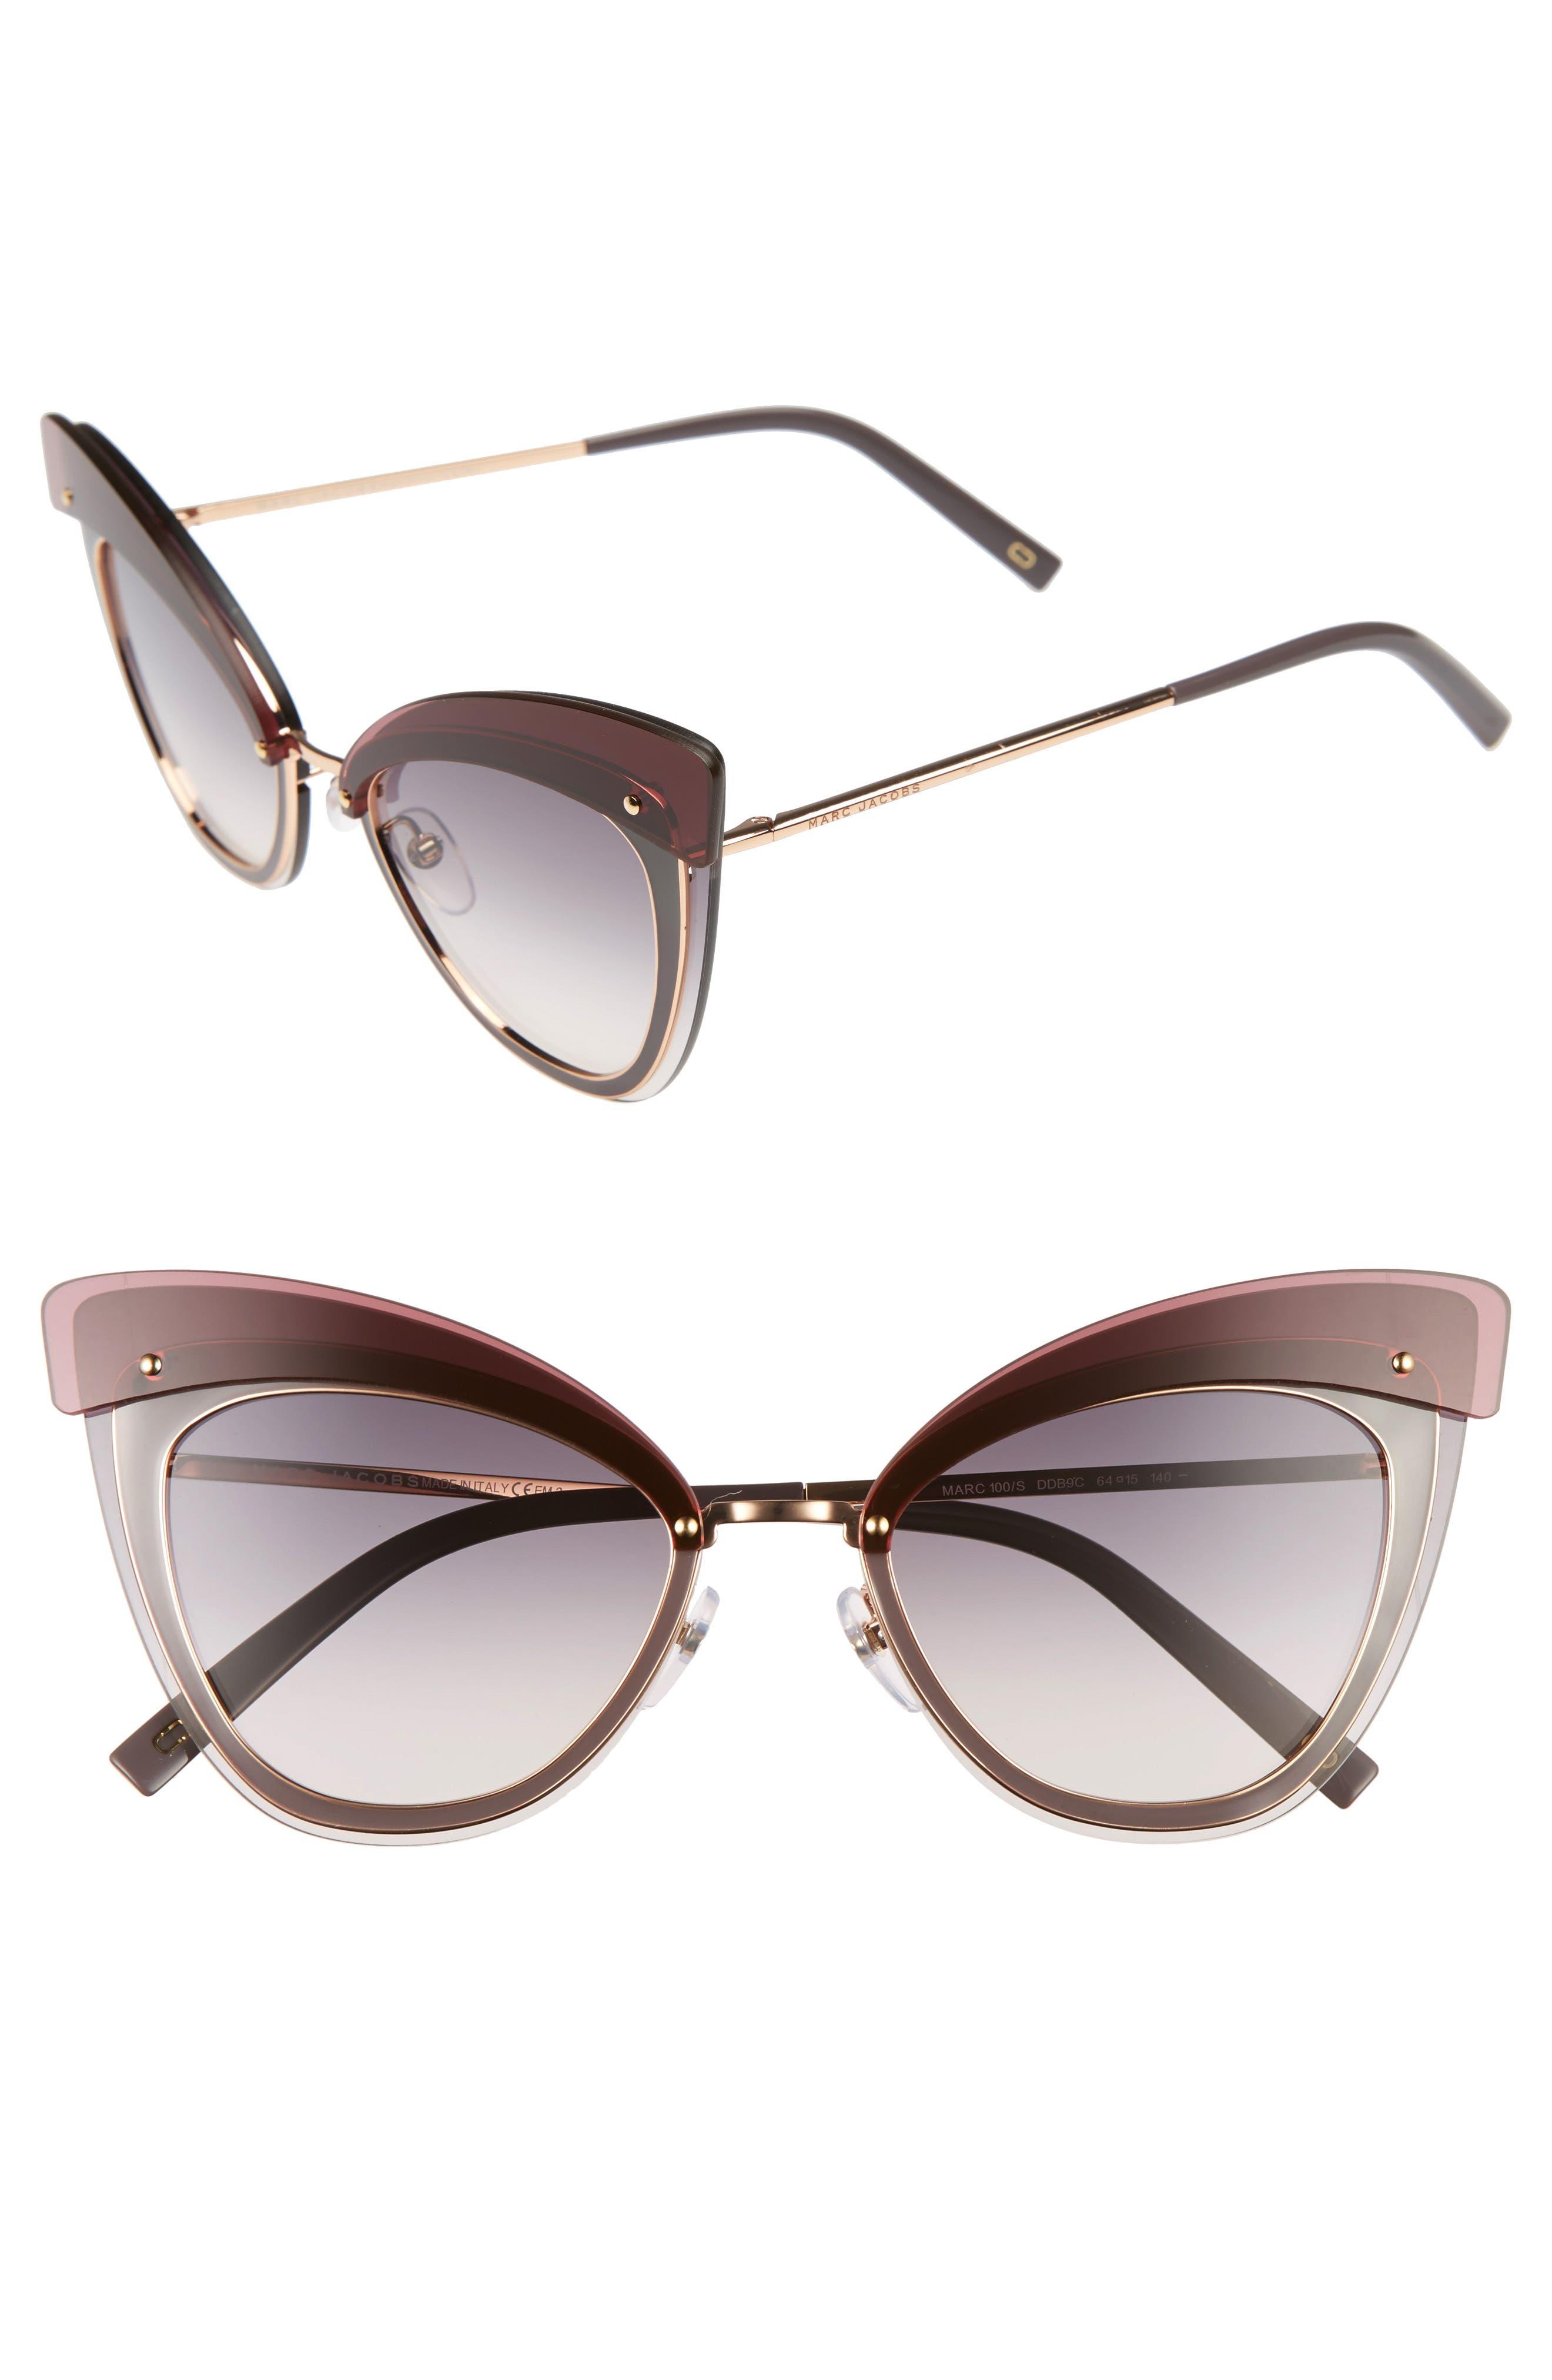 64mm Sunglasses,                             Main thumbnail 2, color,